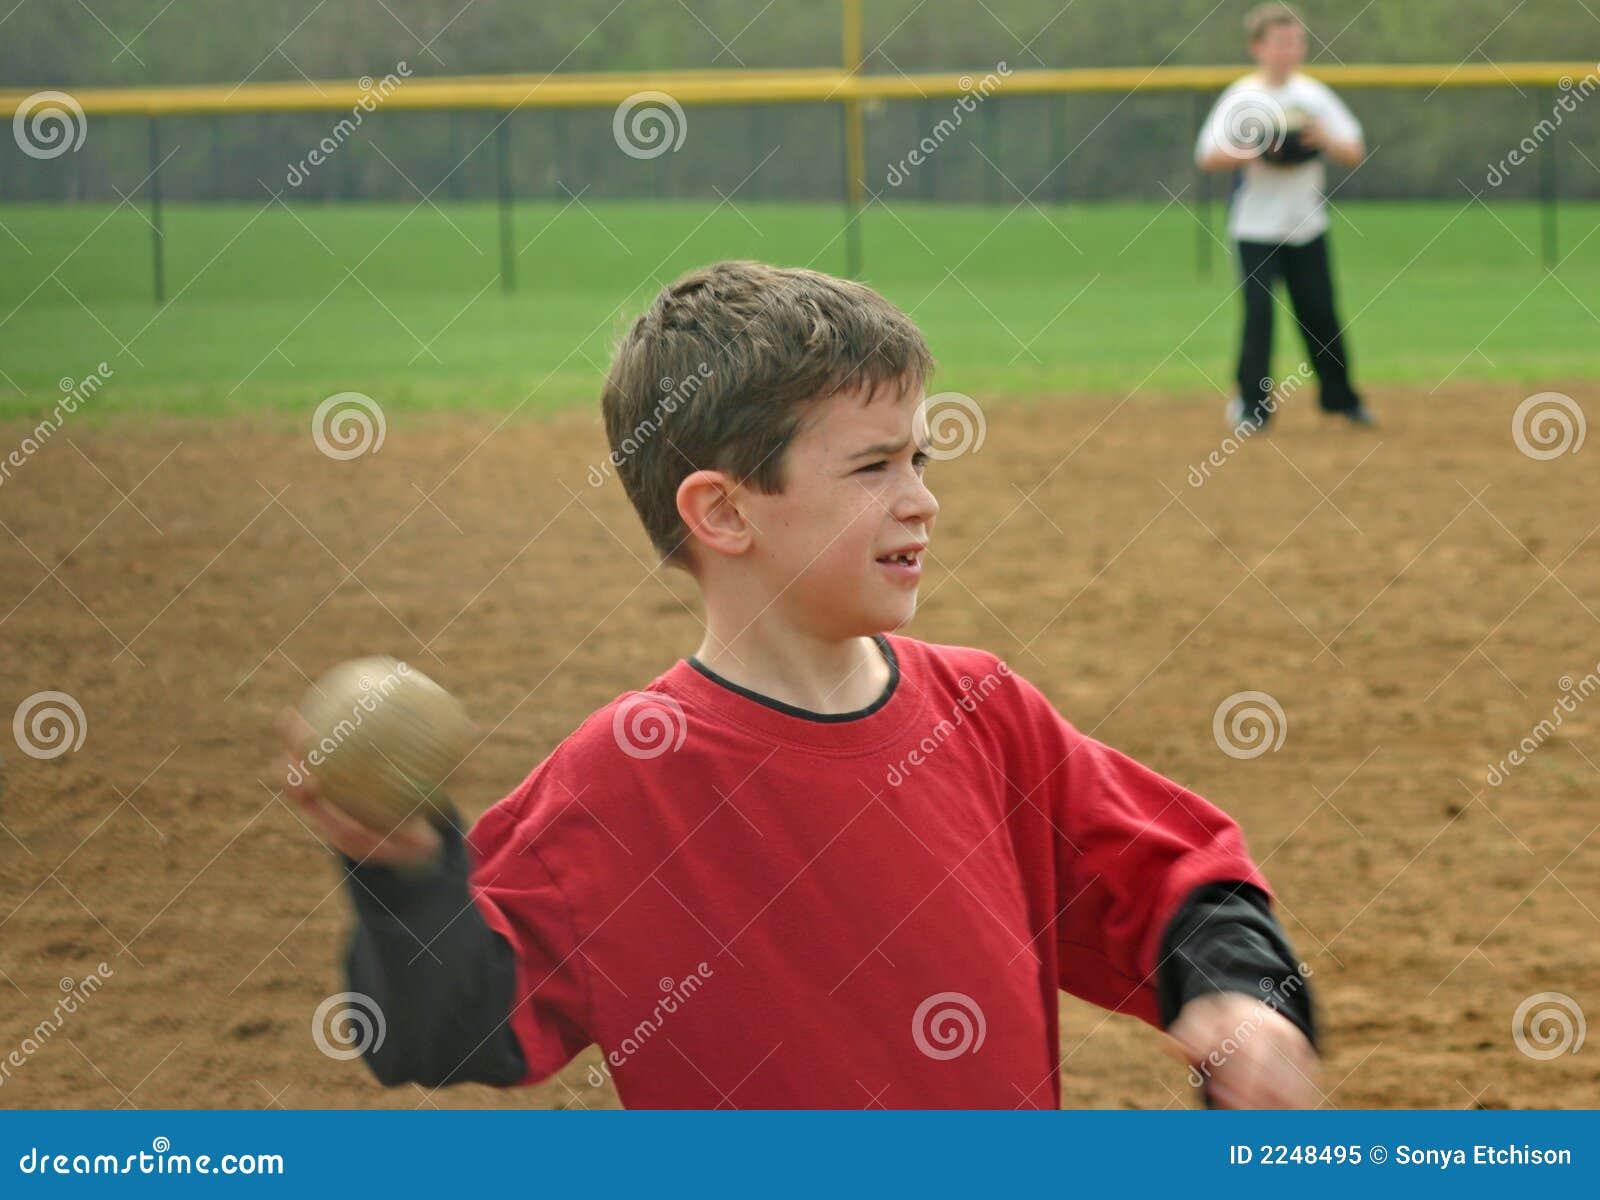 Basebol de jogo do menino